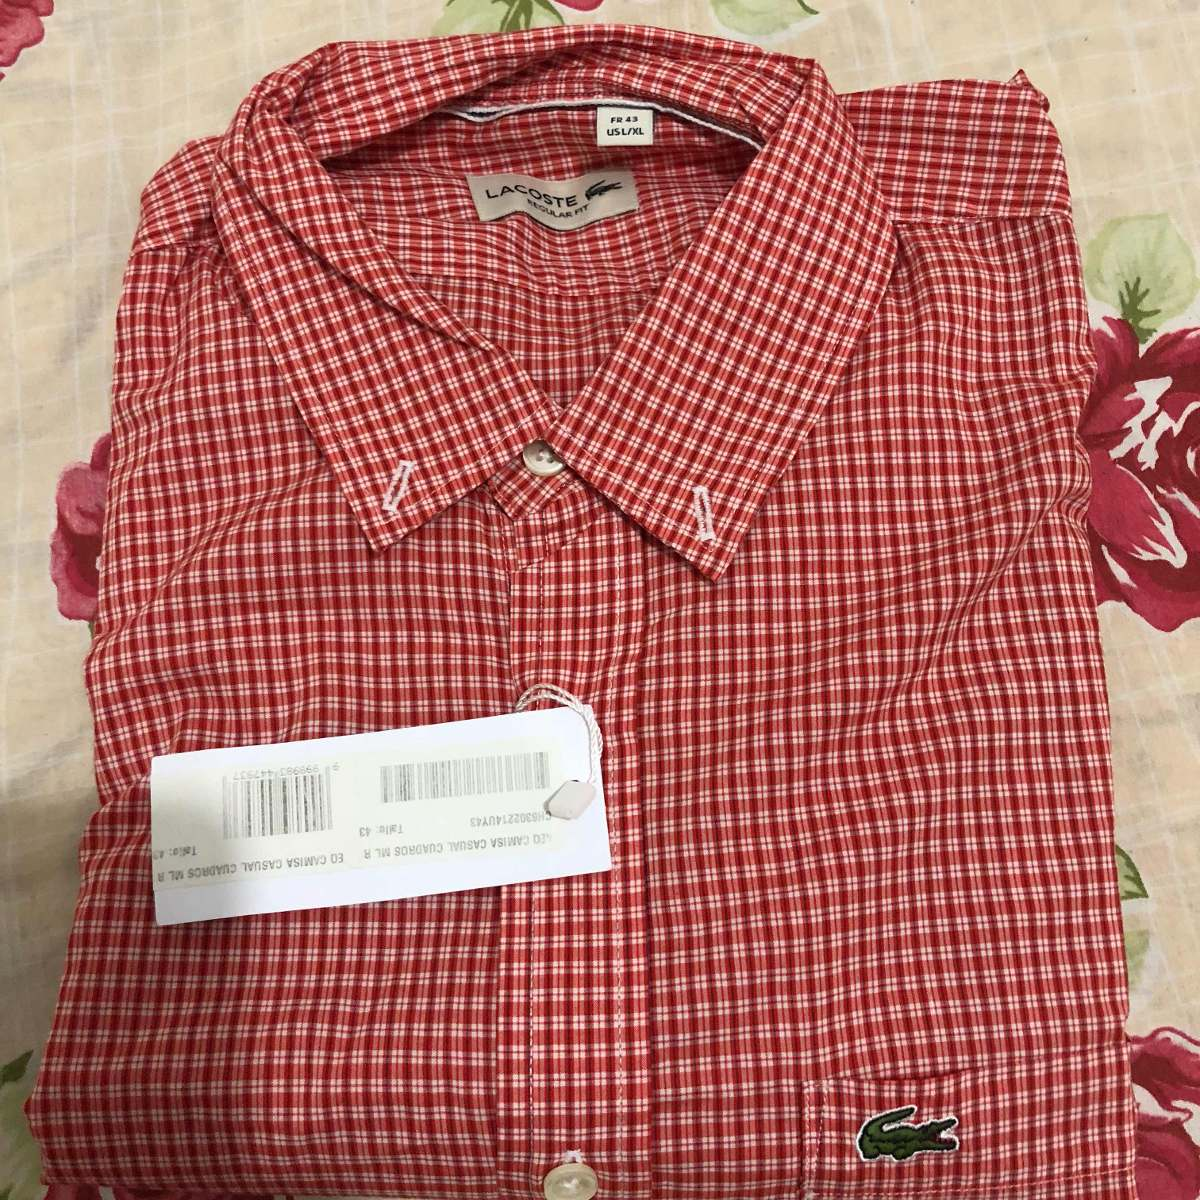 Camisa Xadrez Lacoste Manga Longa Tamanho 43 - R  299,99 em Mercado ... 51cdfdb6e3